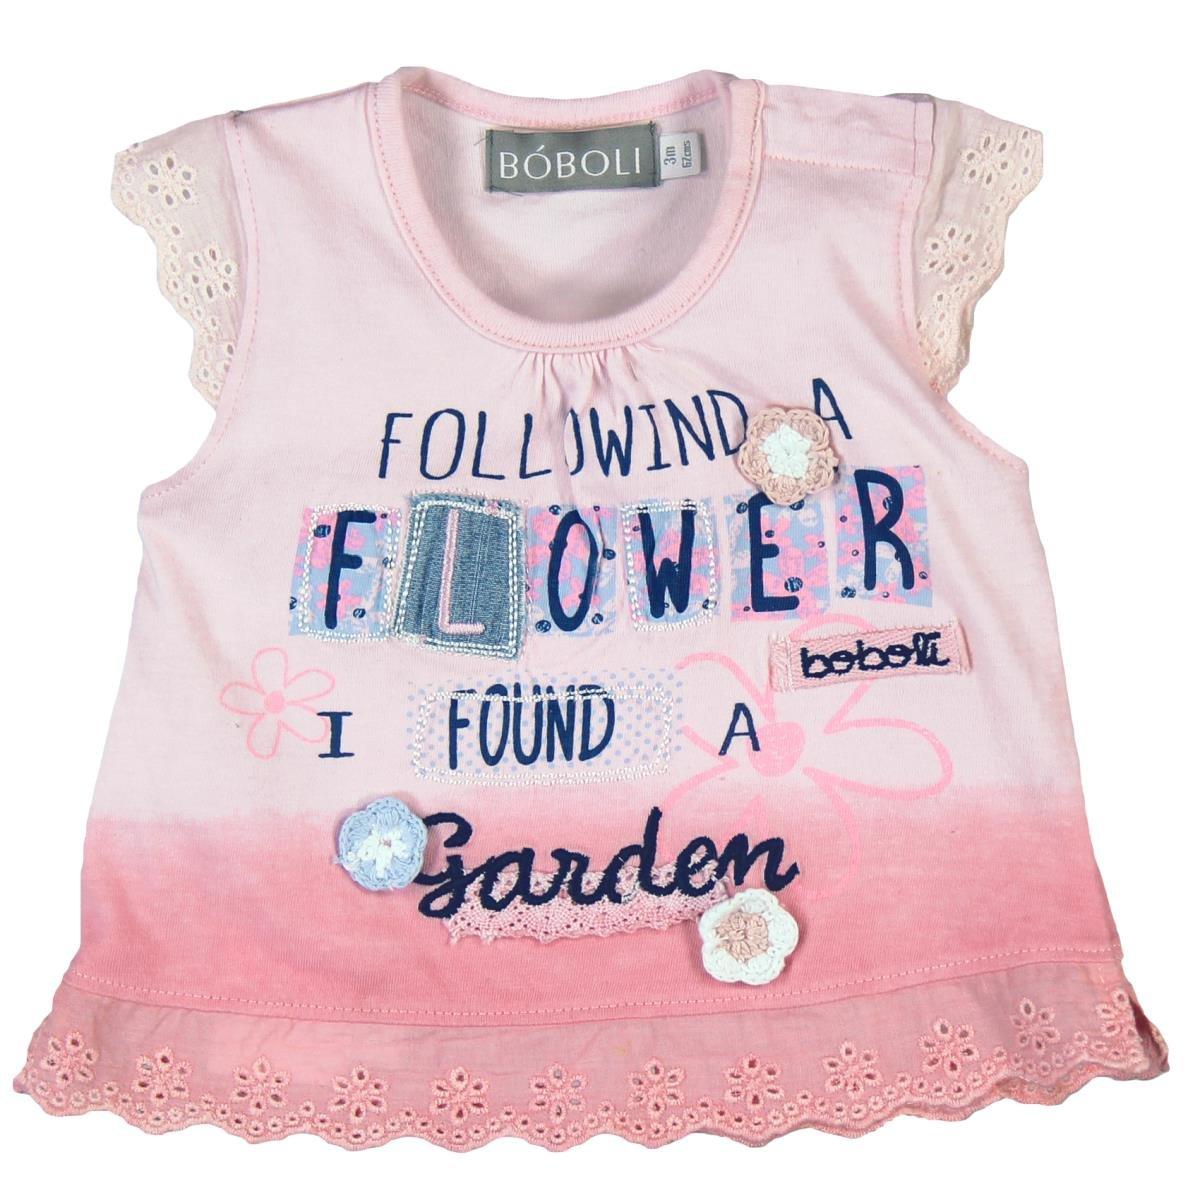 boboli Knit T-Shirt For Baby Girl, Camiseta para Bebés Bóboli